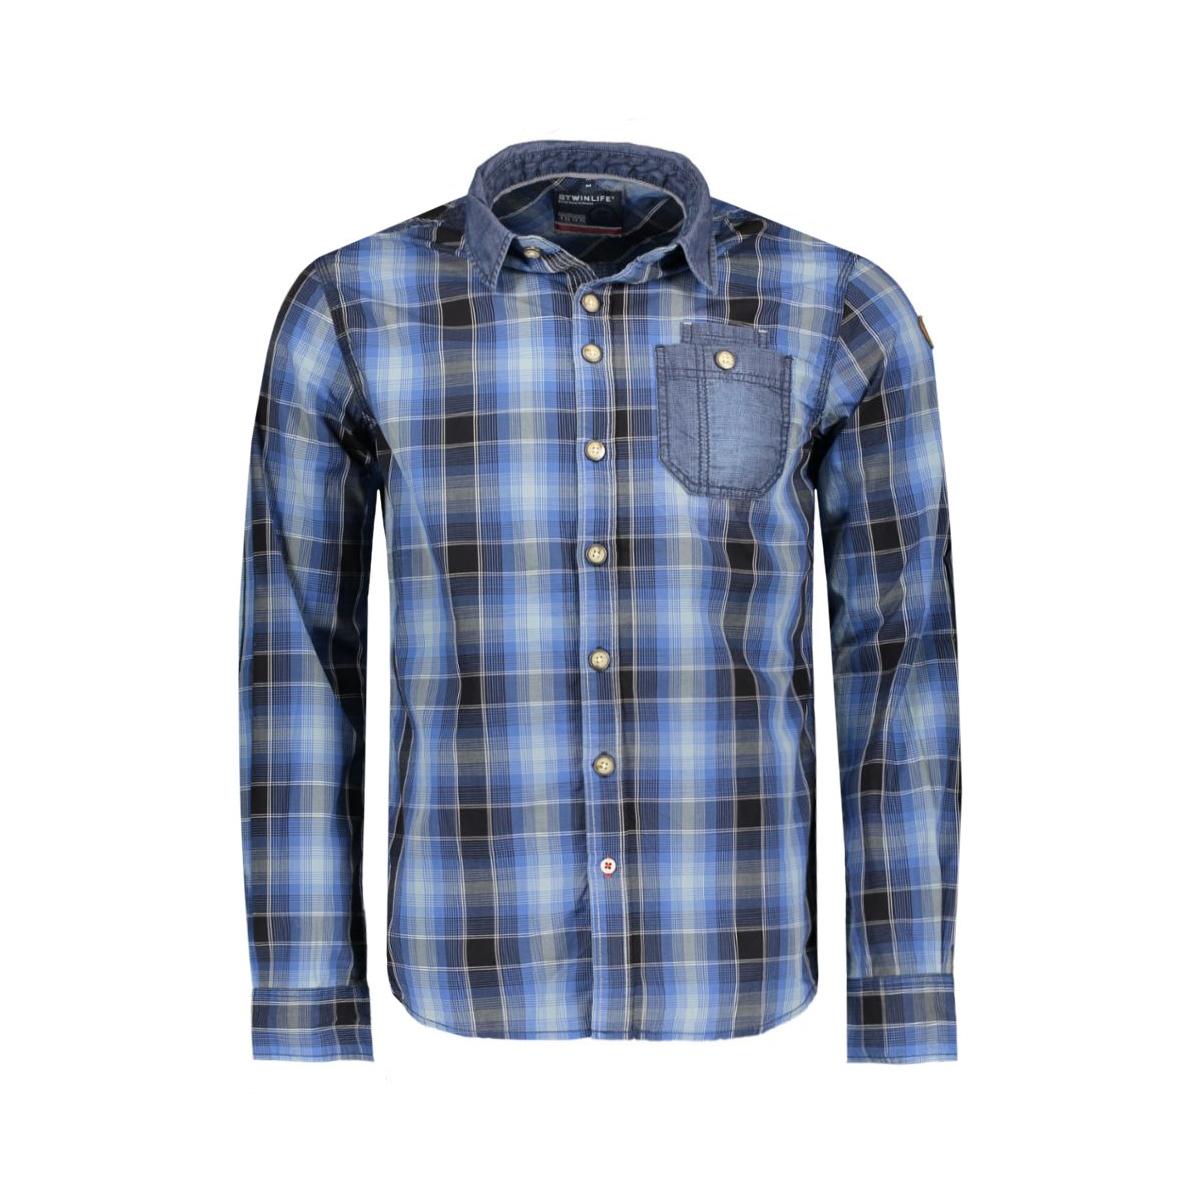 msh651608 twinlife overhemd 6554